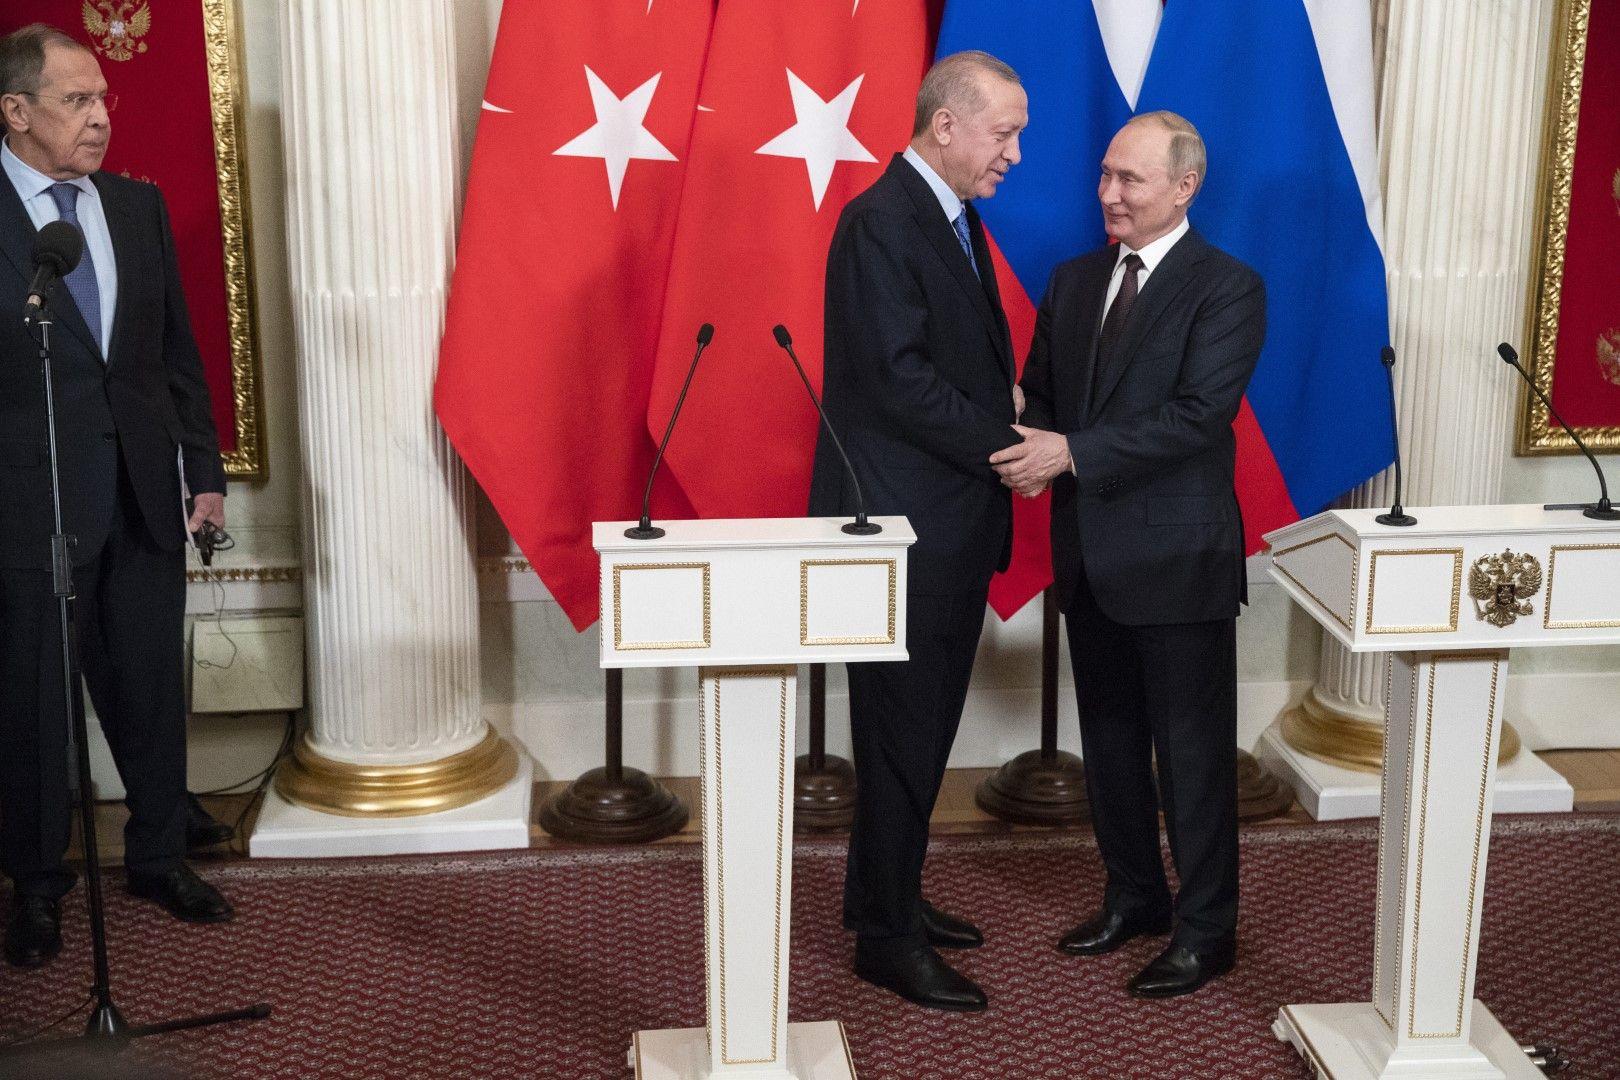 Владимир Путин и Реджеп Тайип Ердоган загърбиха поне привидно разногласията